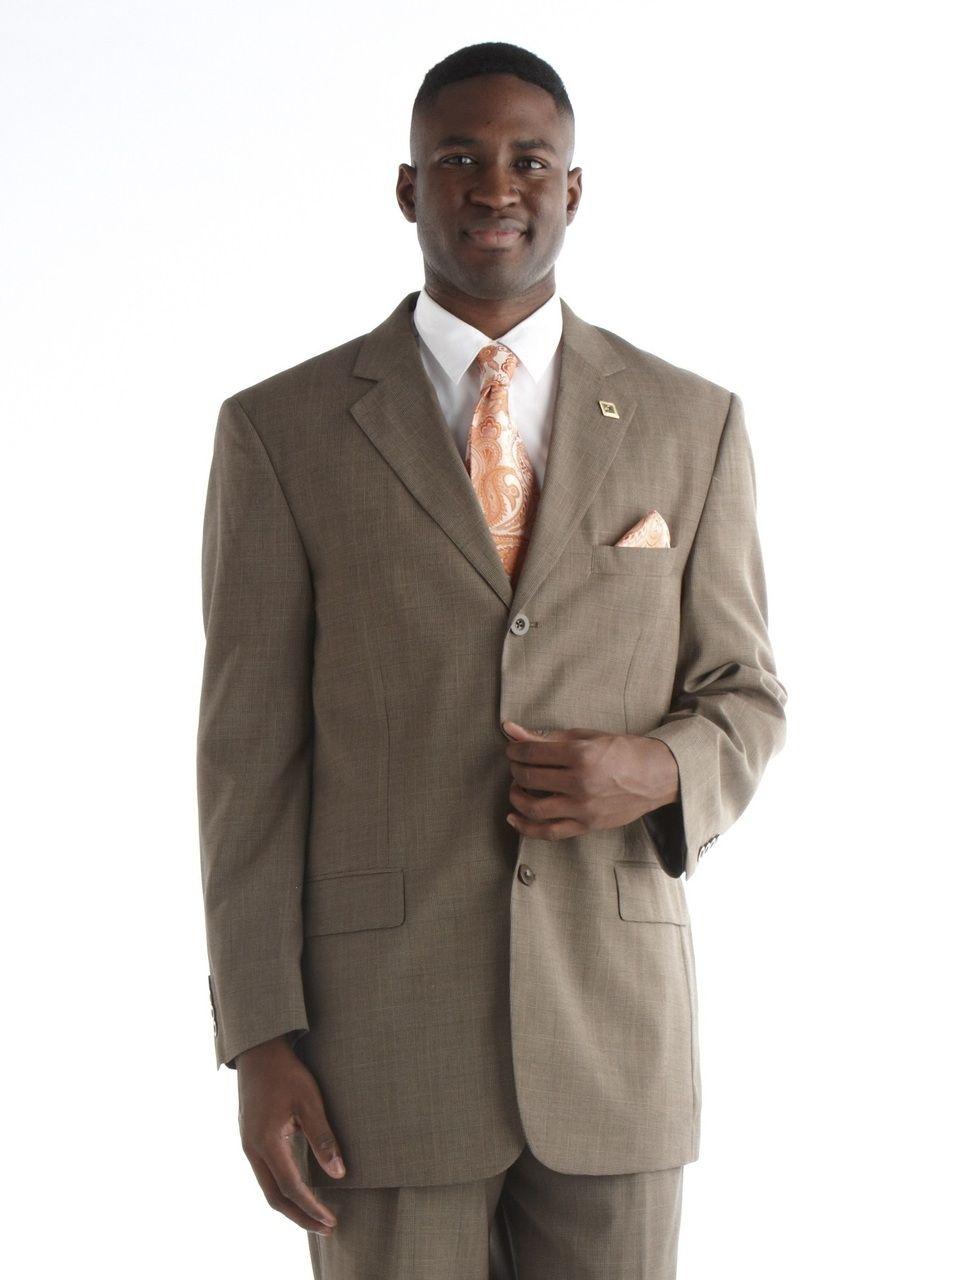 Stacy Adams Plaid Suit - Brown